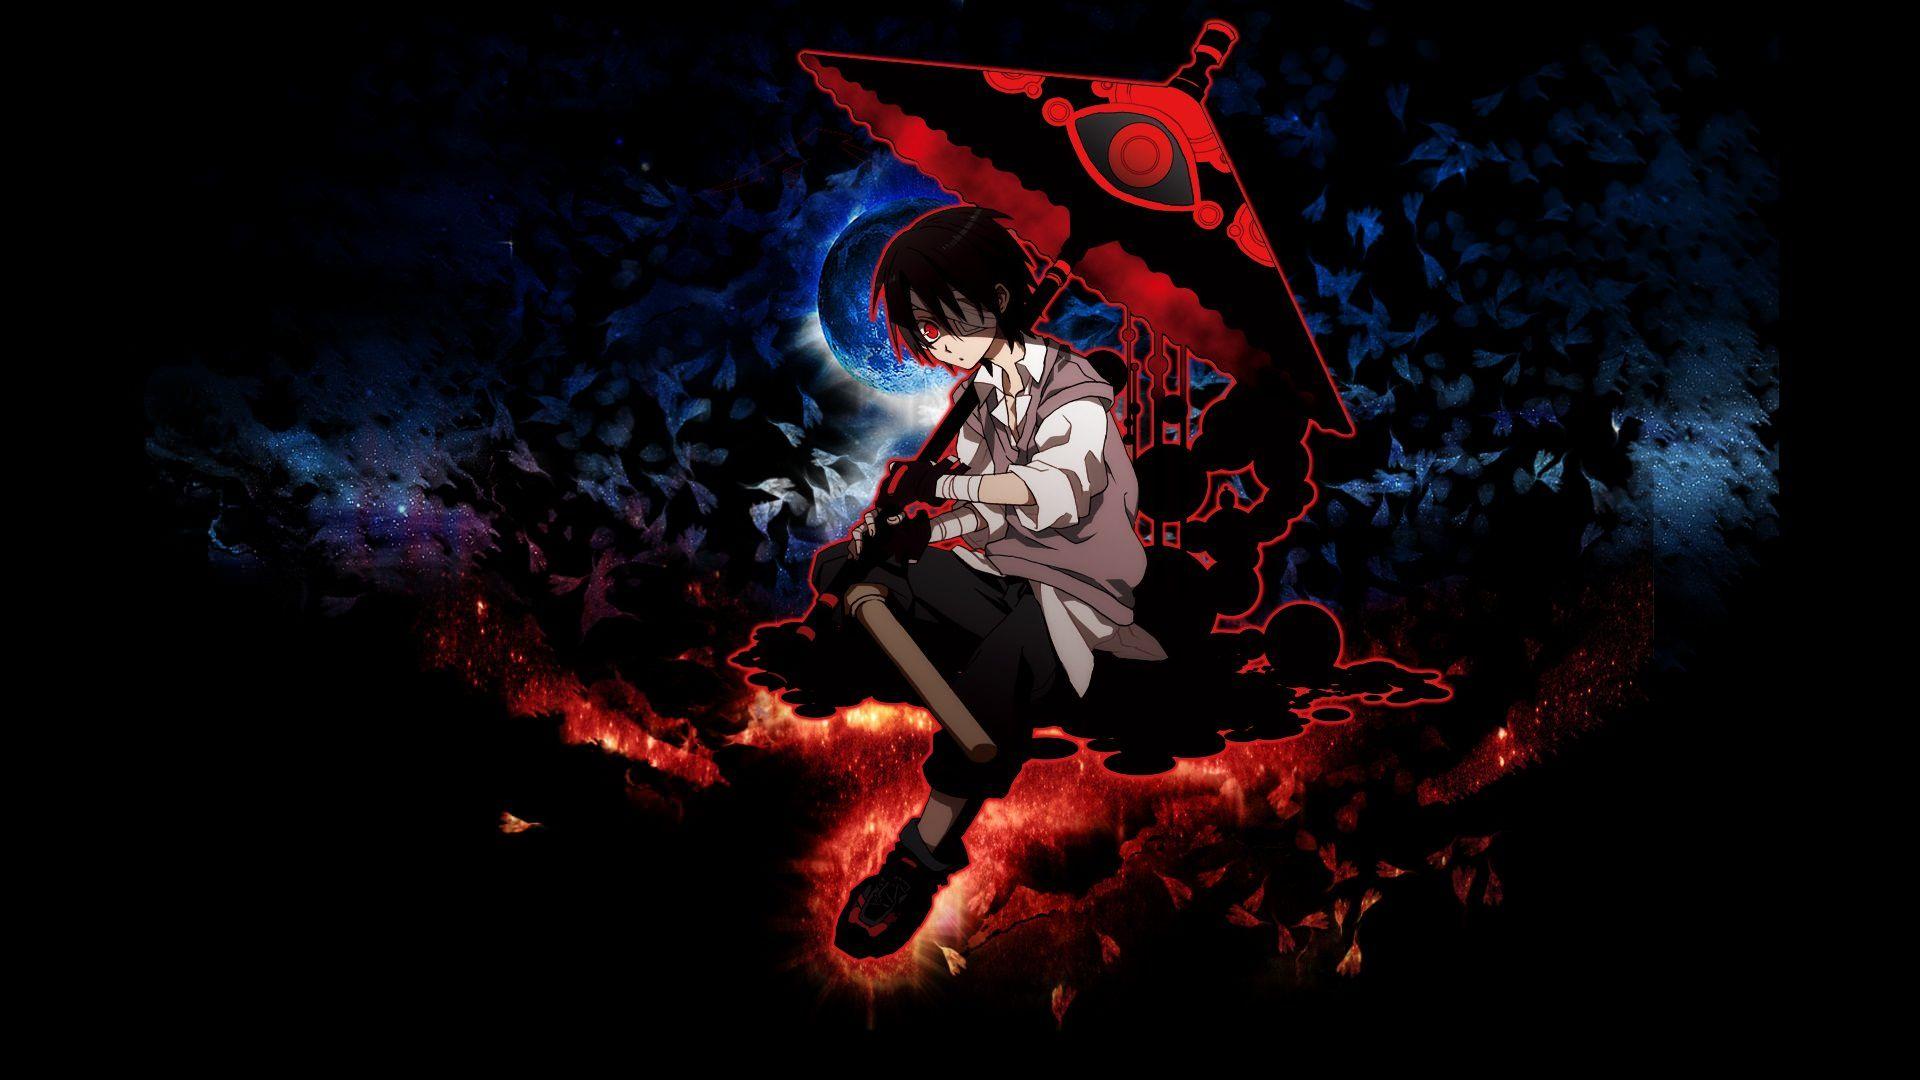 Wallpaper download online - Anime Hd Wallpaper Download